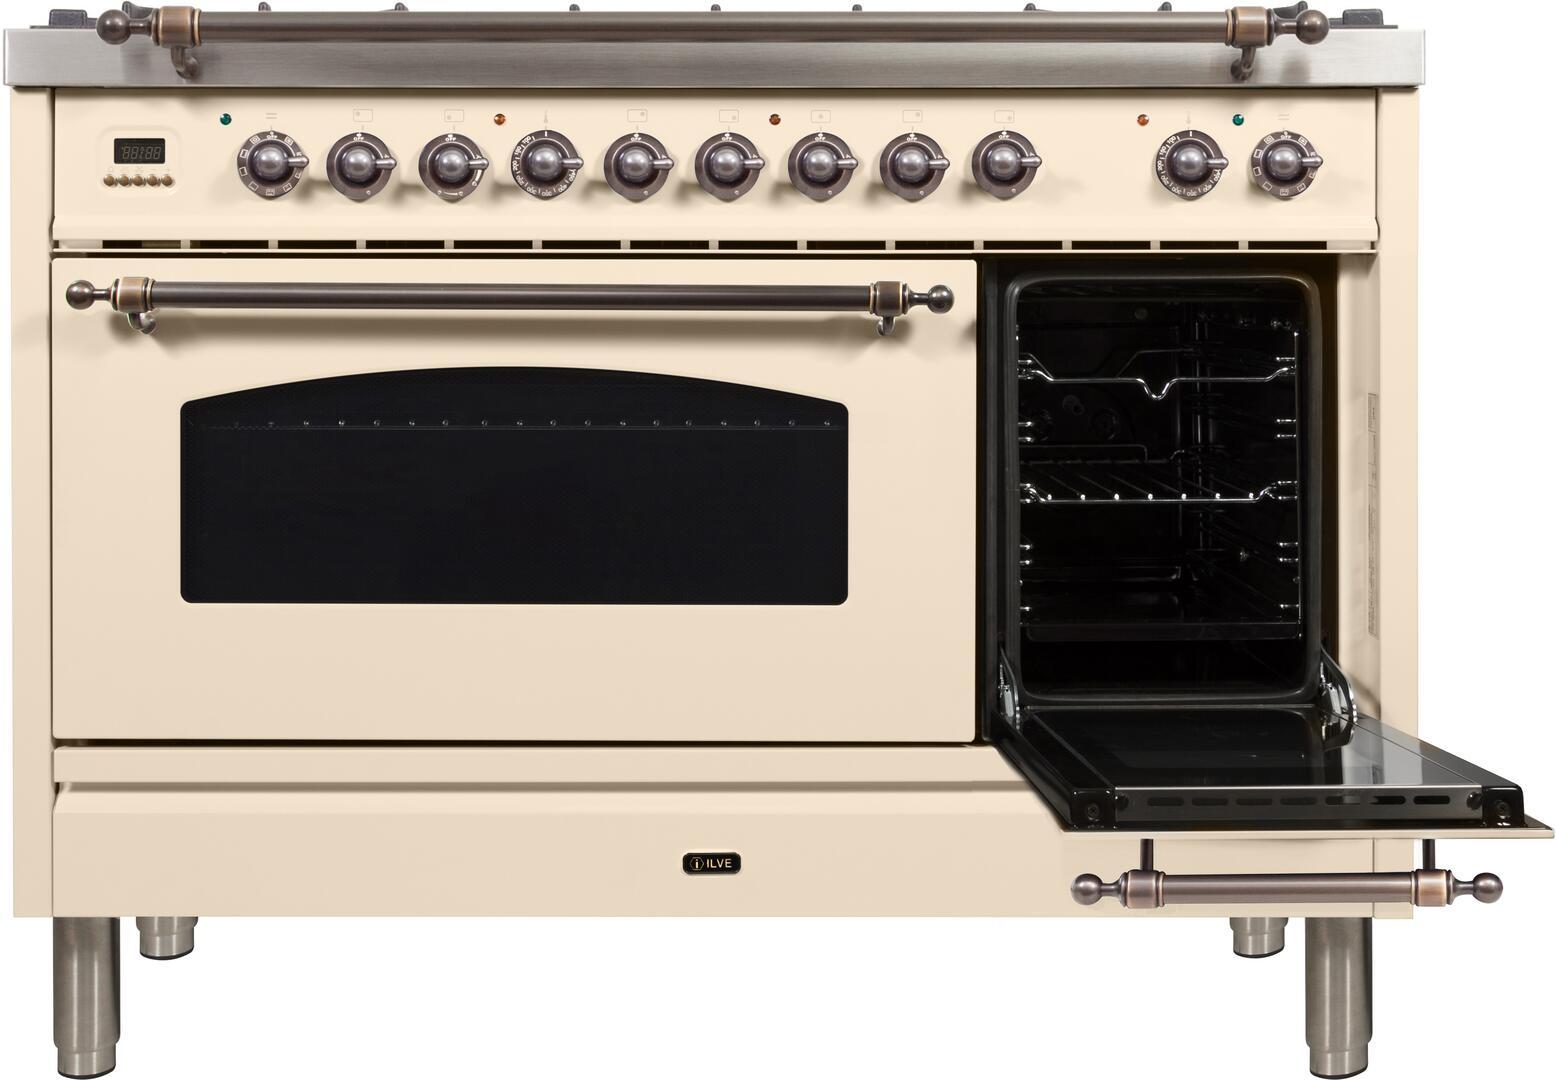 Ilve Nostalgie UPN120FDMPAY Freestanding Dual Fuel Range Bisque, ilve UPN120FDMPAY range open door1